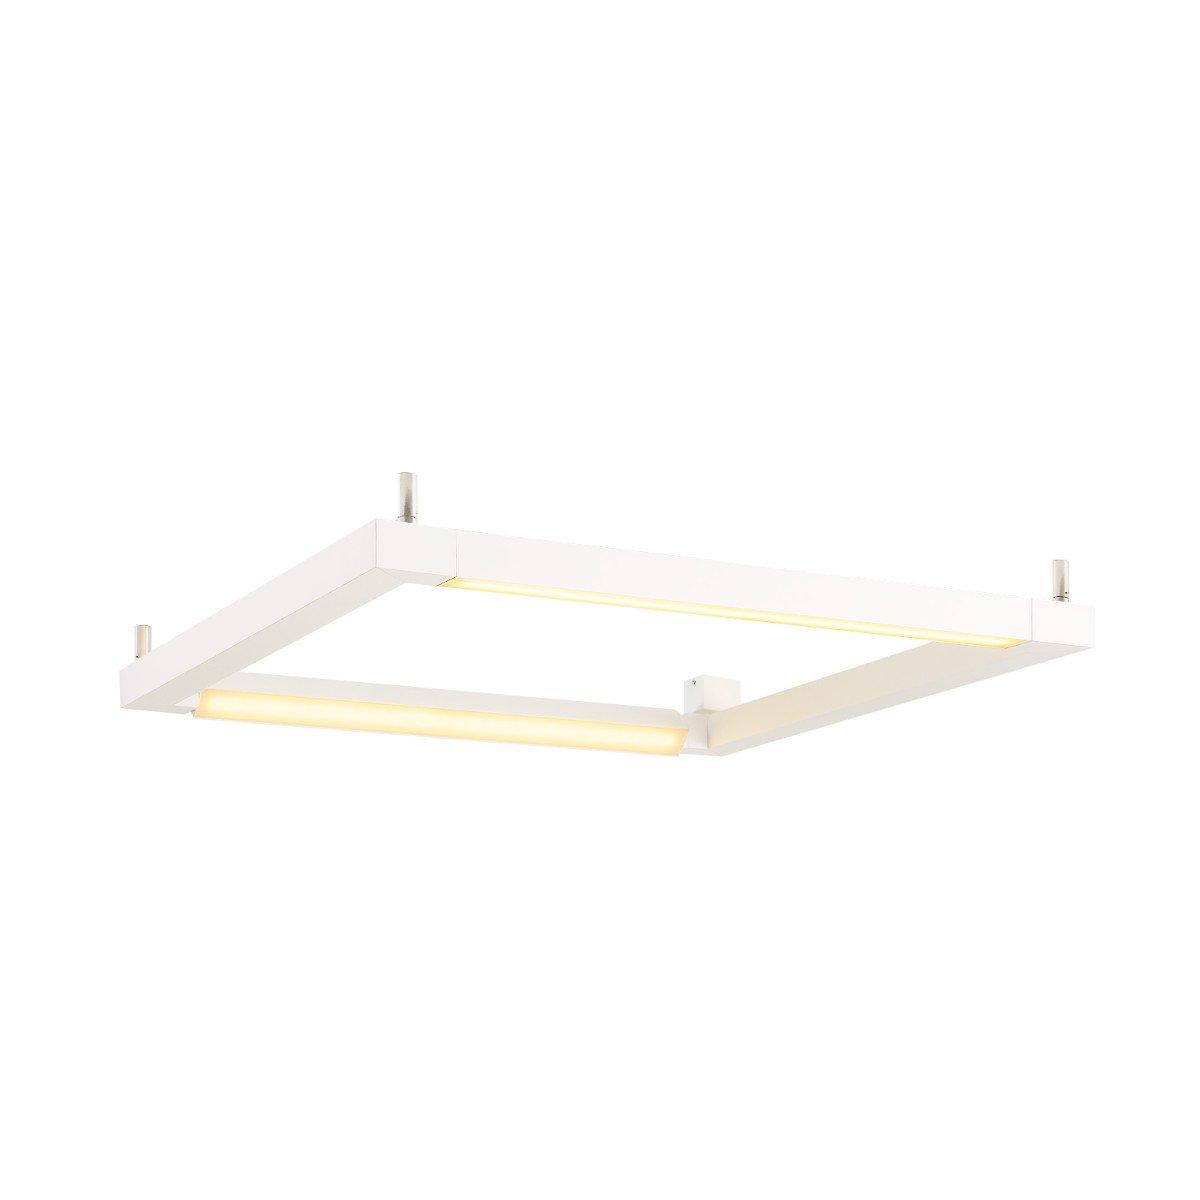 SLV - verlichting Wandlamp Open-Grill SLV. 1001294